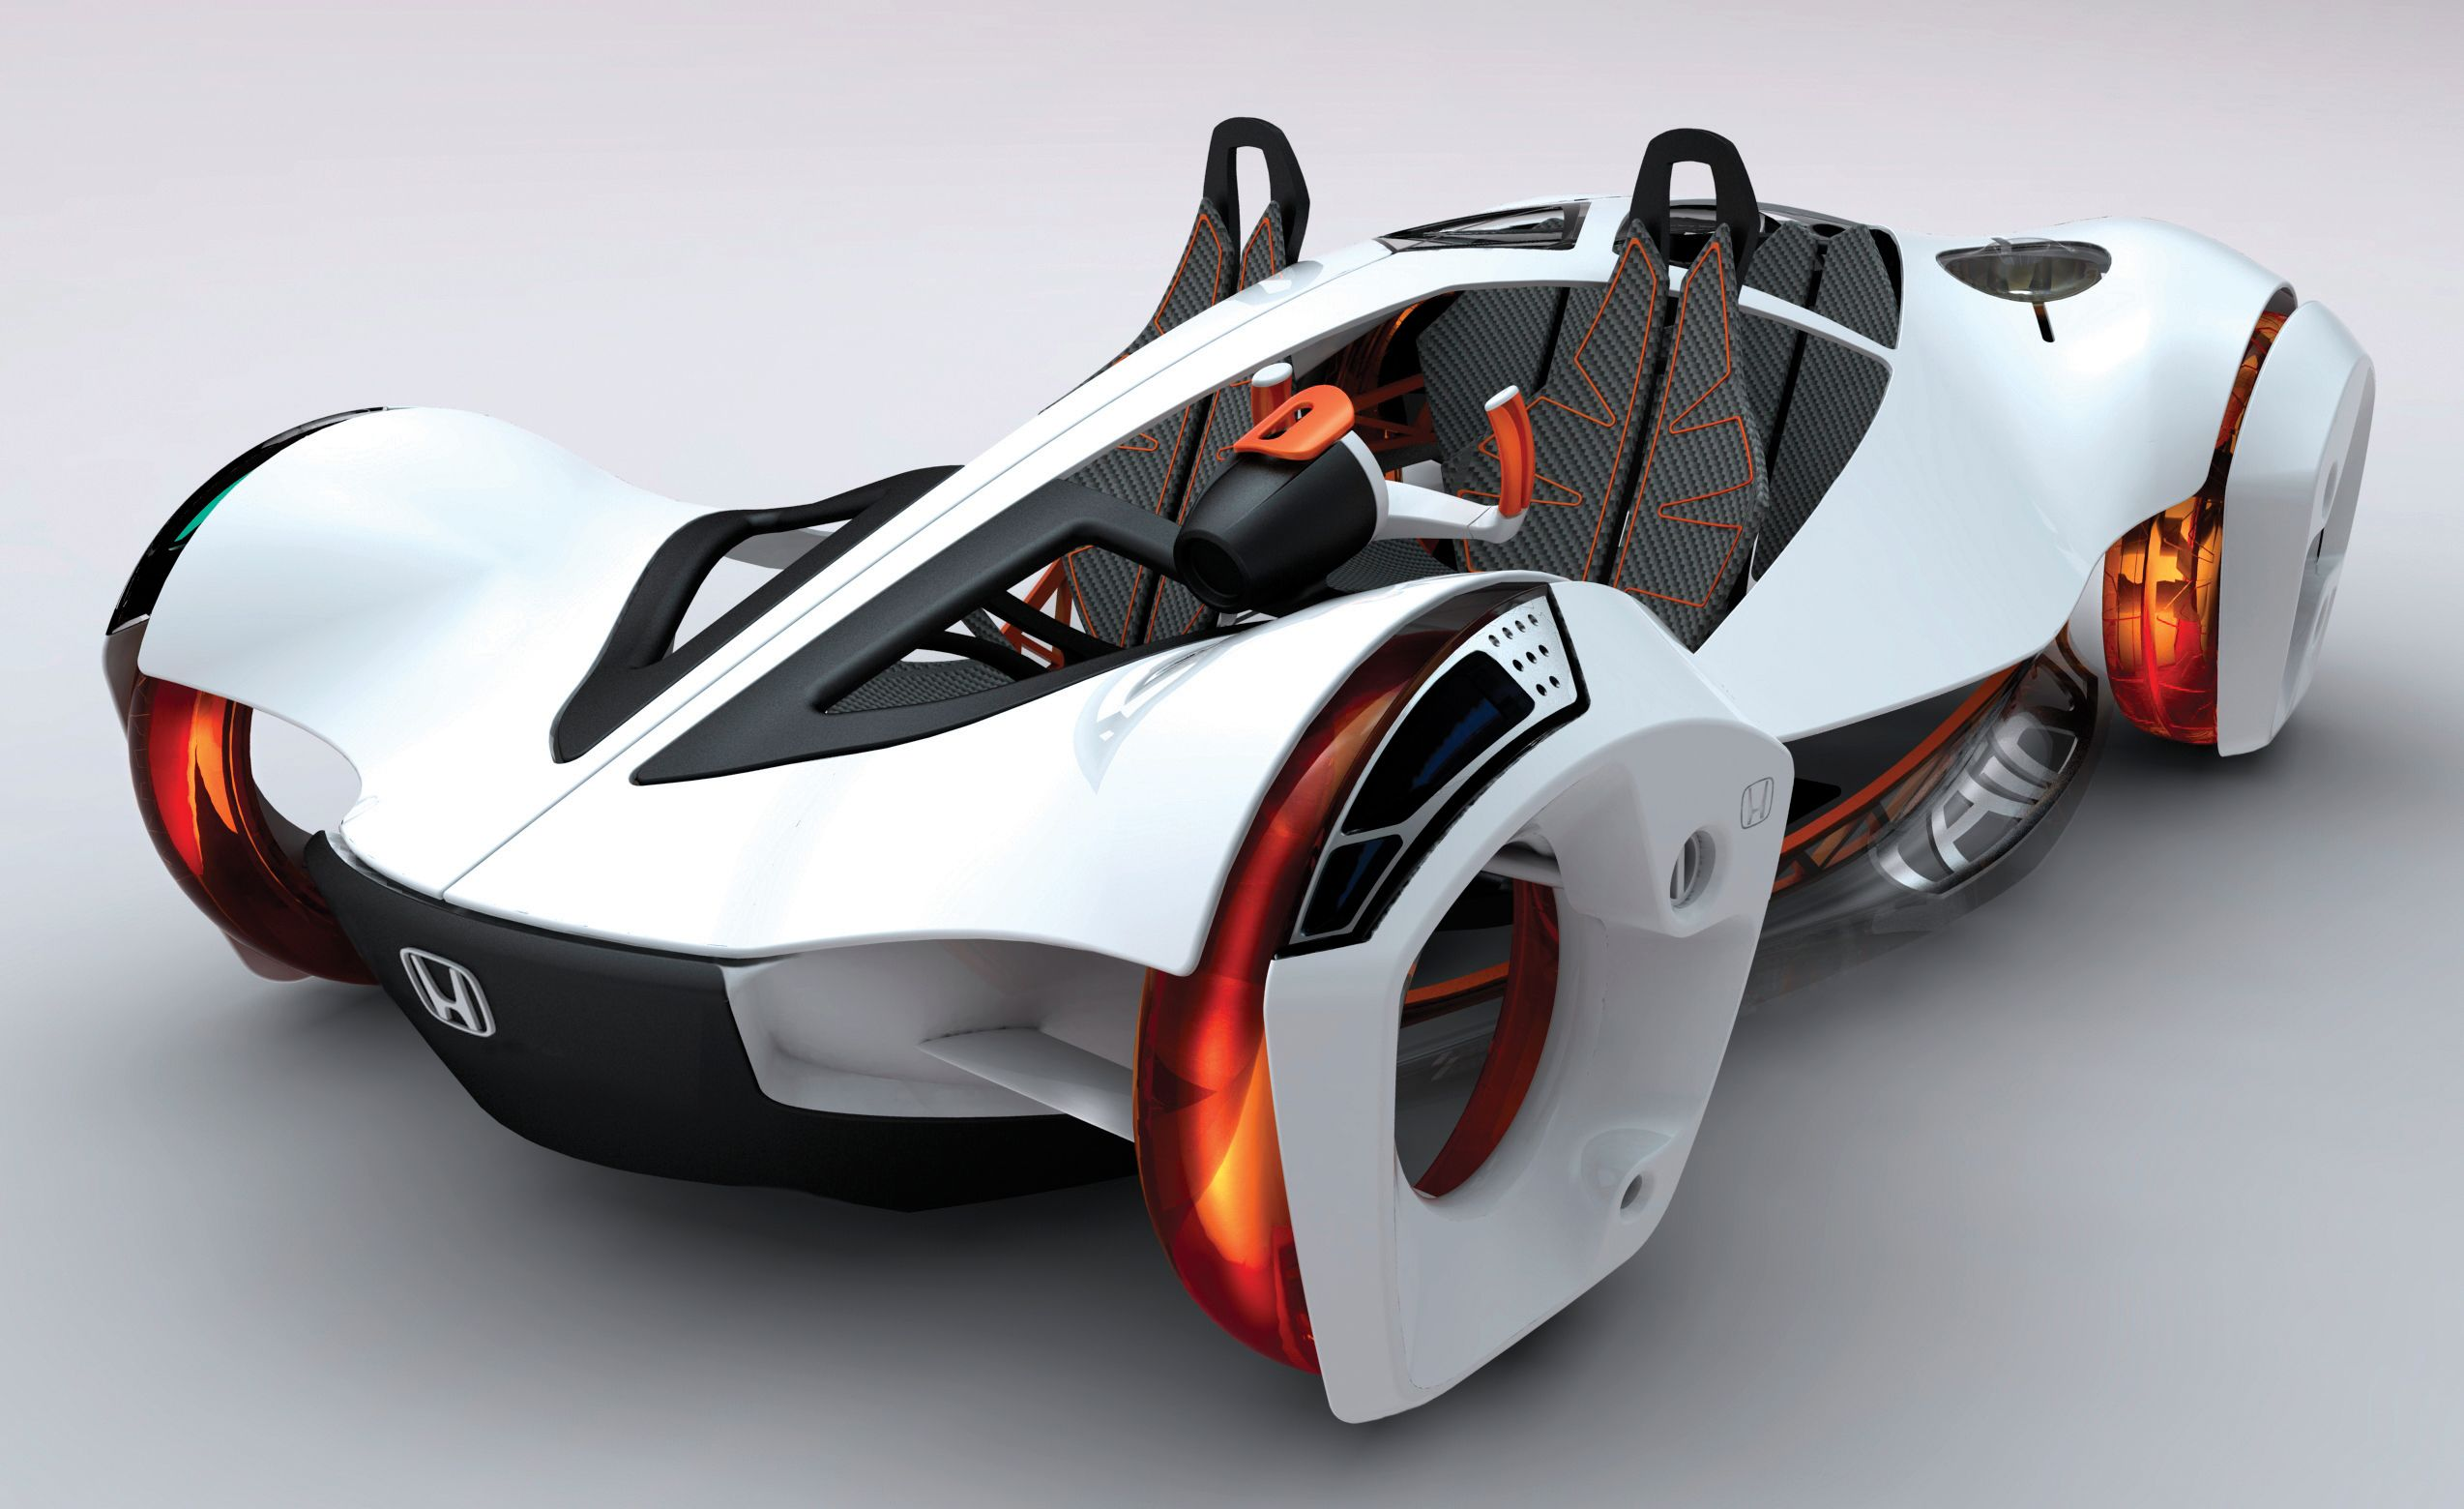 Honda Air concept Flying car, Concept cars, Future car